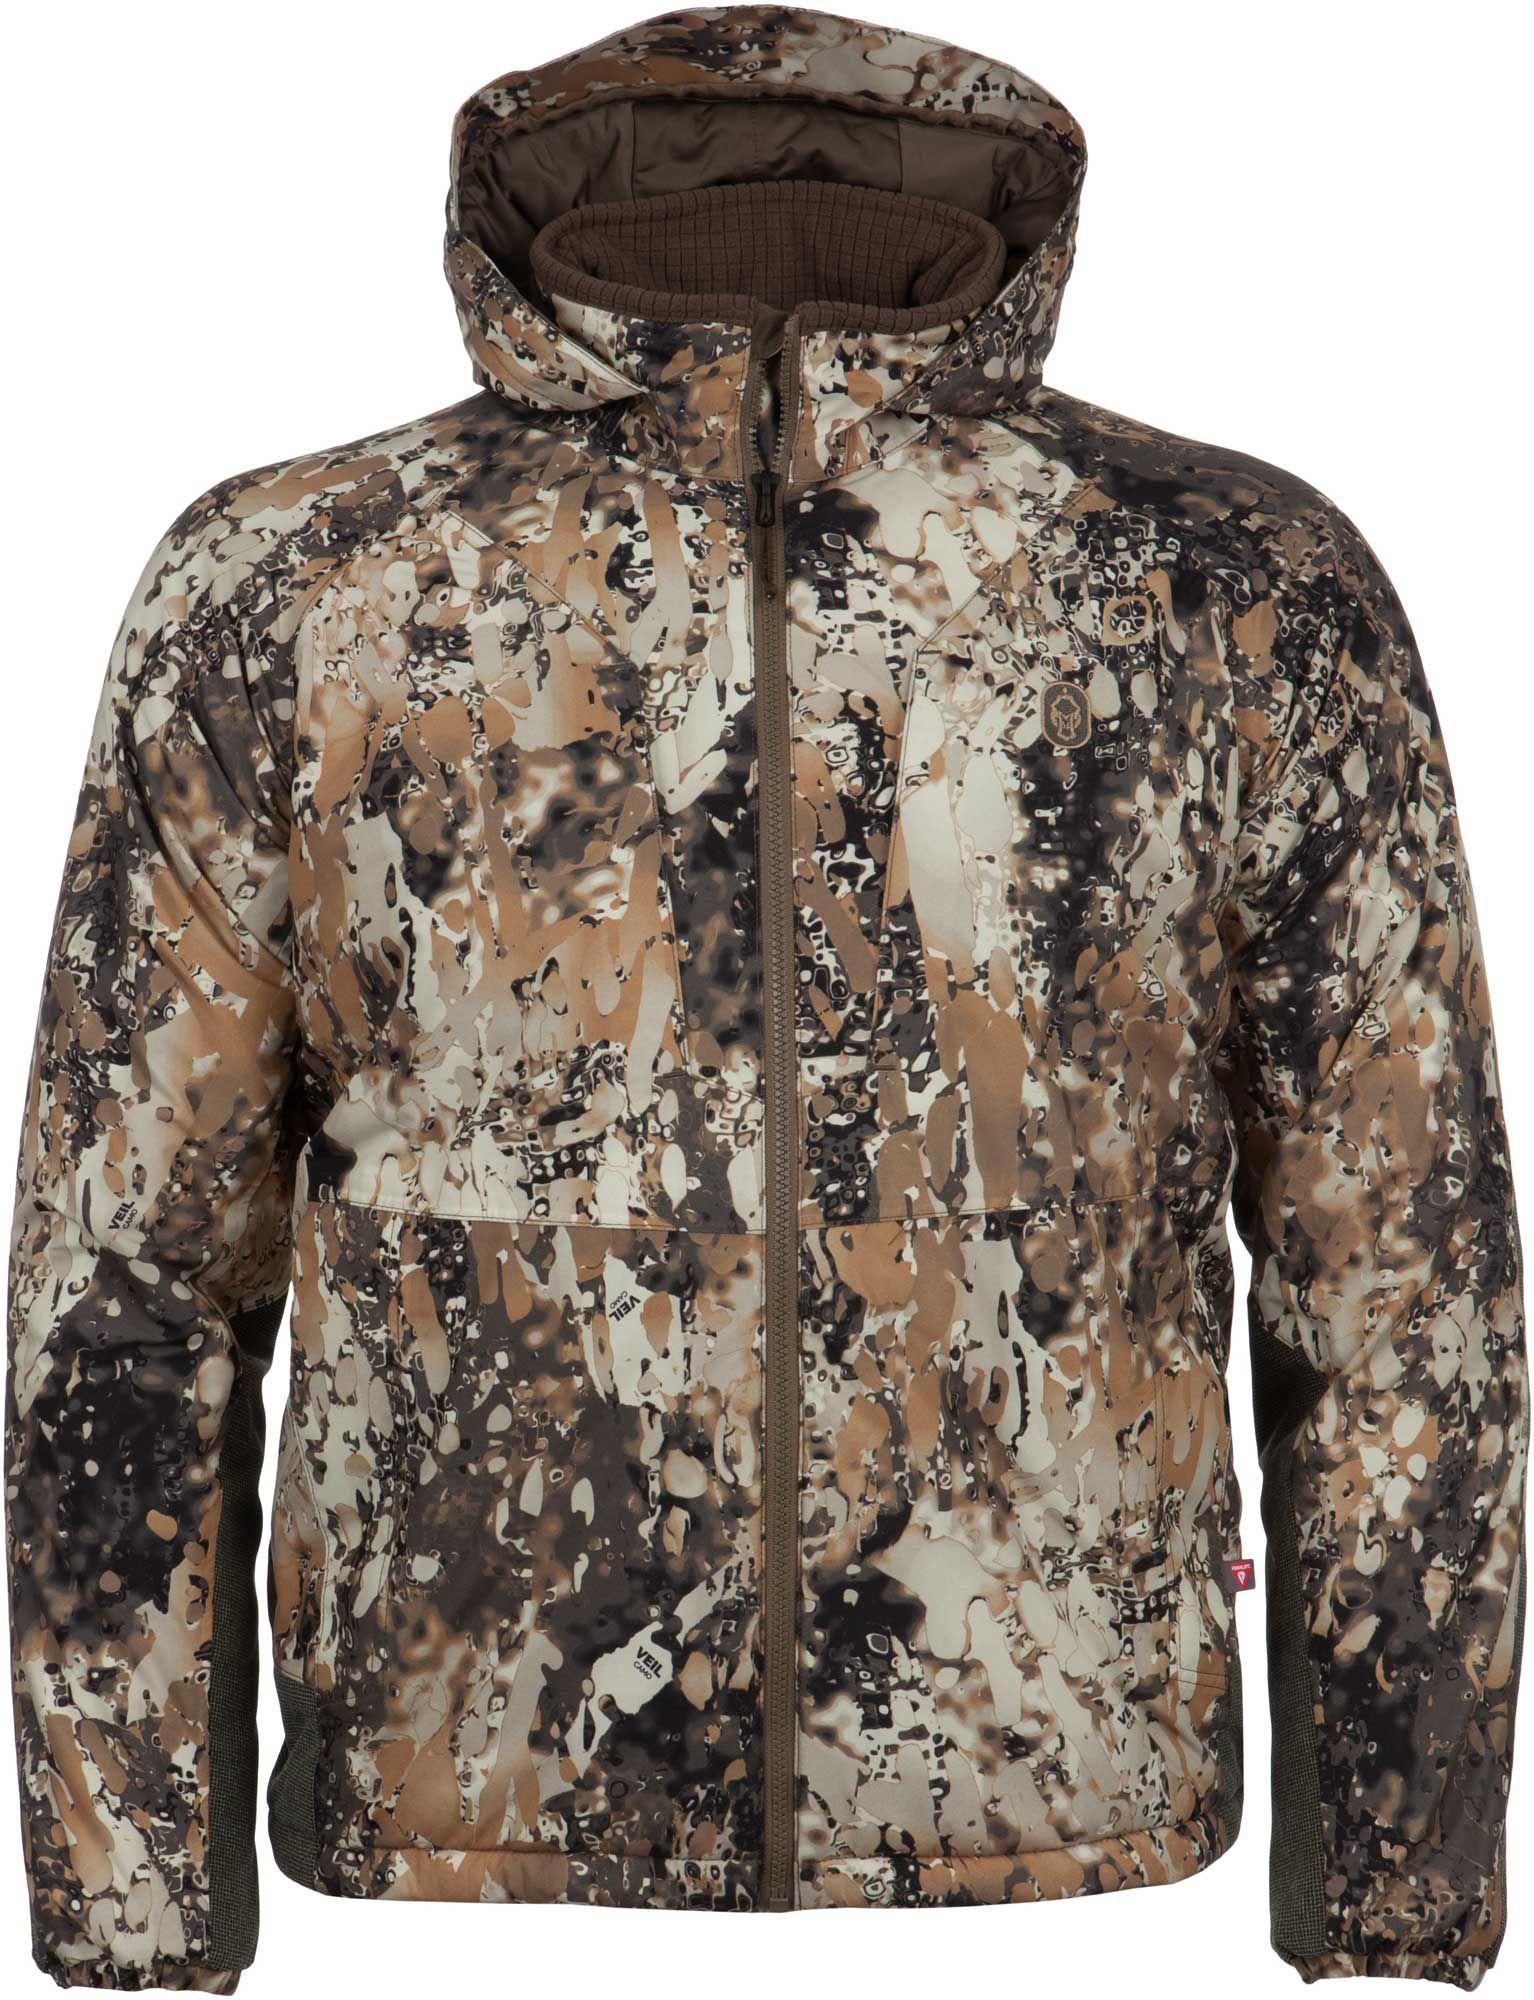 Hardcore Men's Thermal Extreme Hunting Jacket, Size: Medium, Multi thumbnail